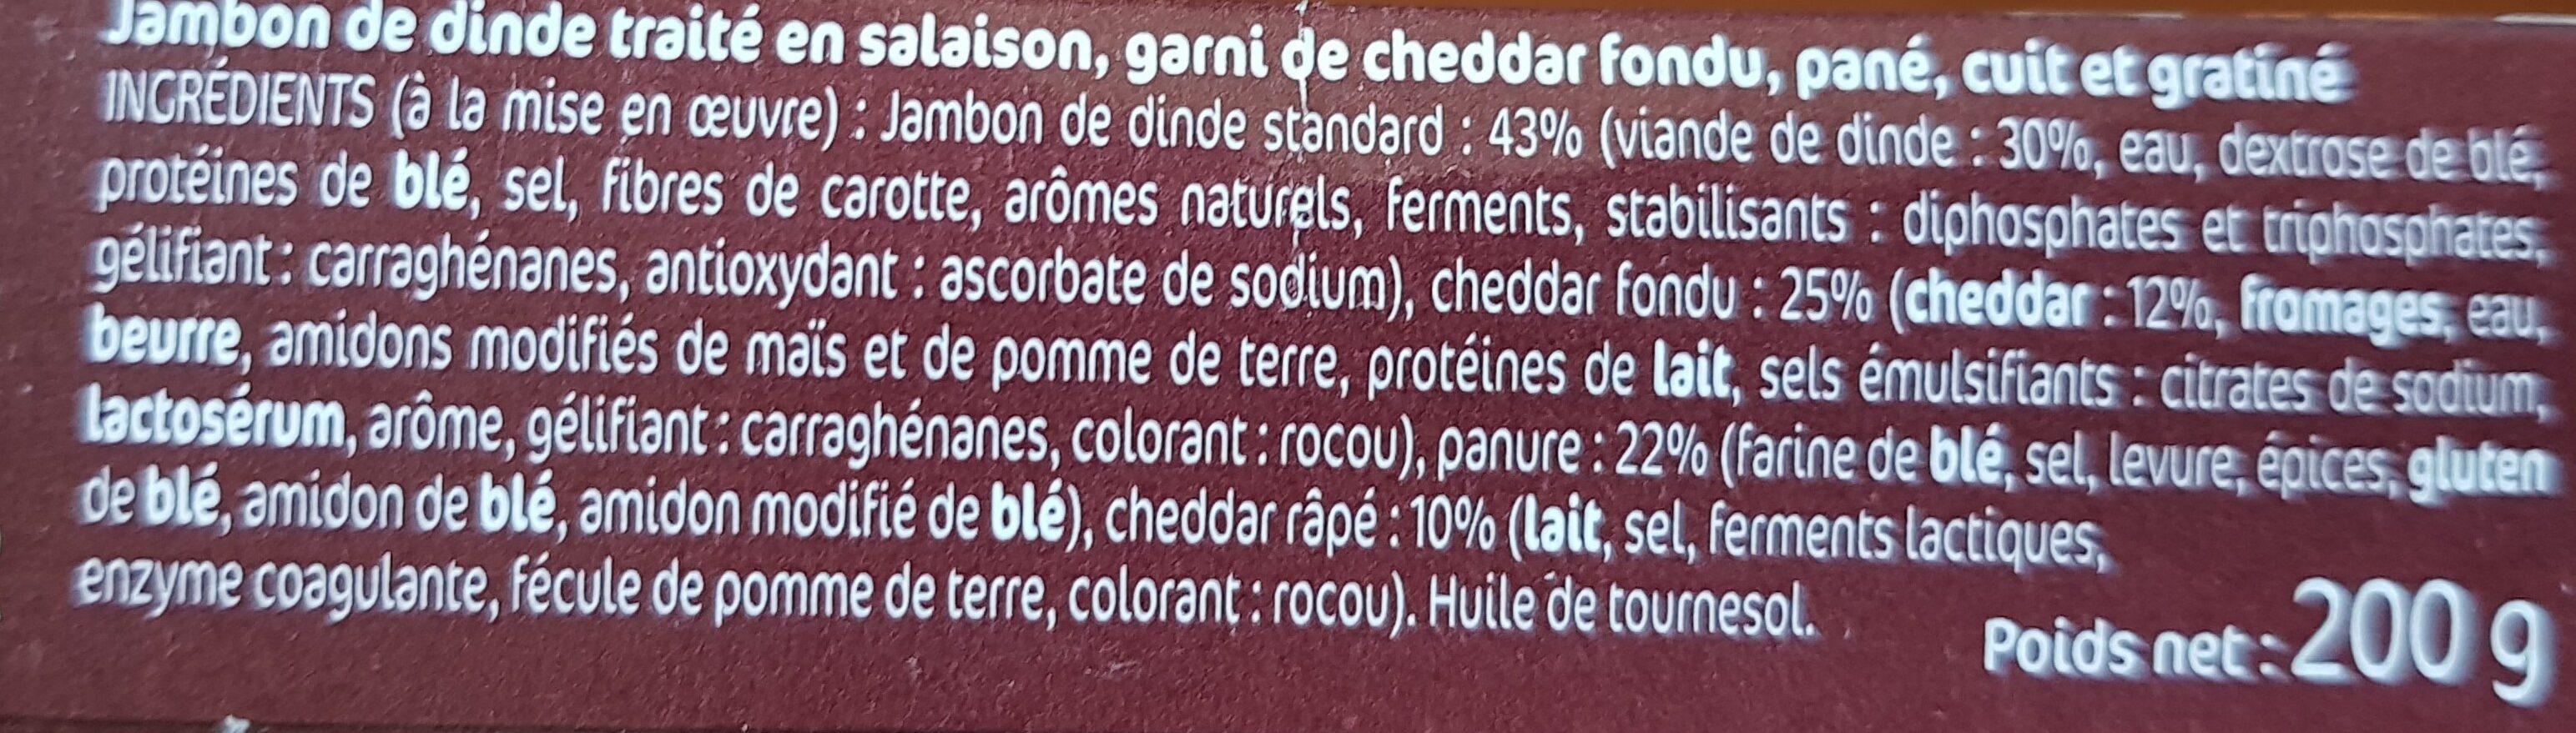 Croq' Extra Cheddar, Gratiné et Fondant x2 - Ingredients